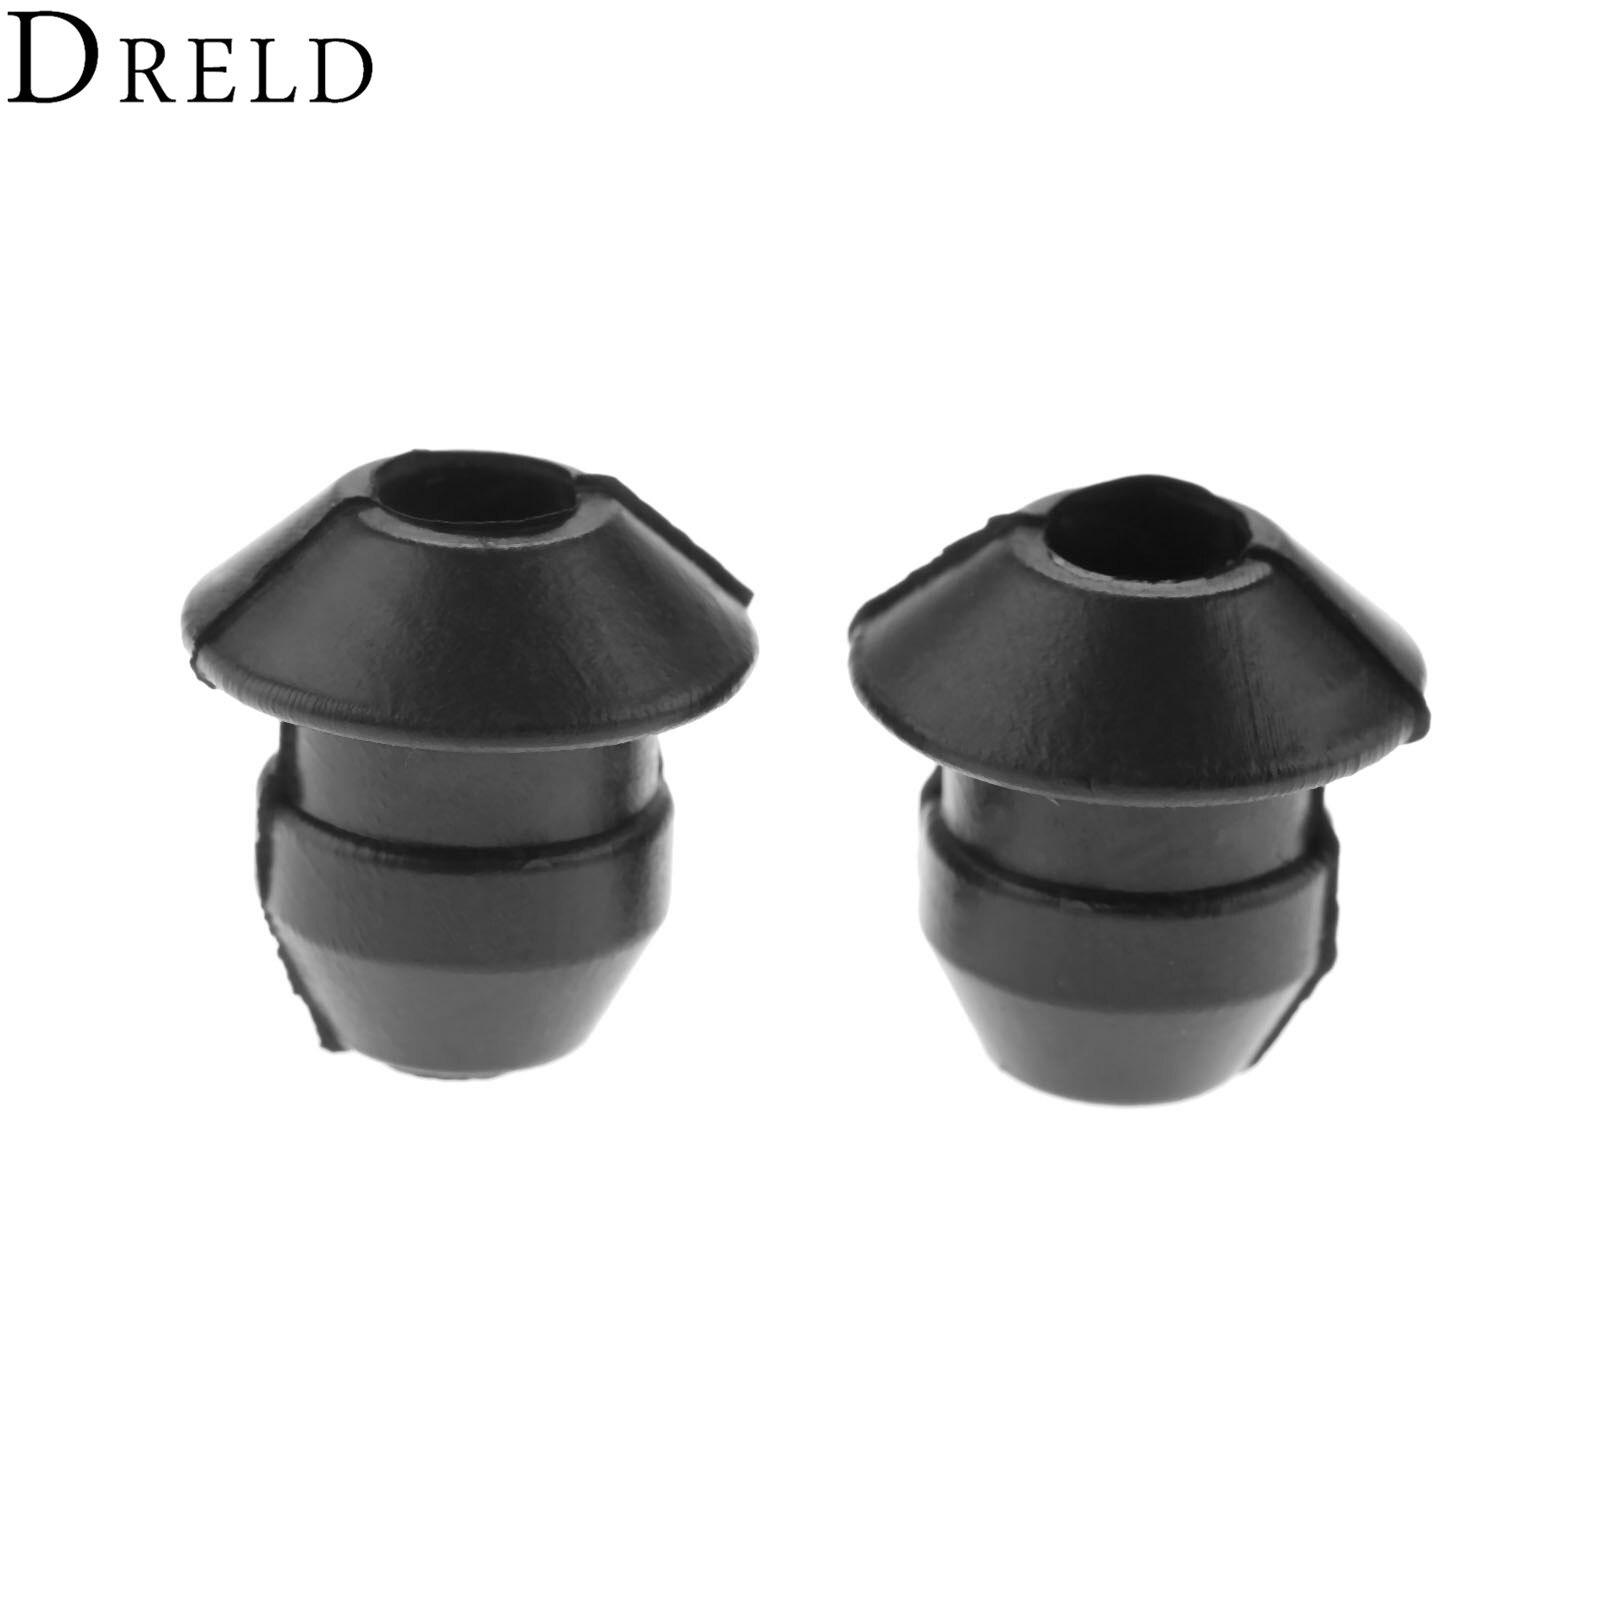 DRELD 2Pcs Fuel Line Tank Grommet For Stihl Trimmer FS80 FS85 FS88 KM85 HS80 HS85 FC75 FS76 FS74 SR320 OEM # 0000 989 0516